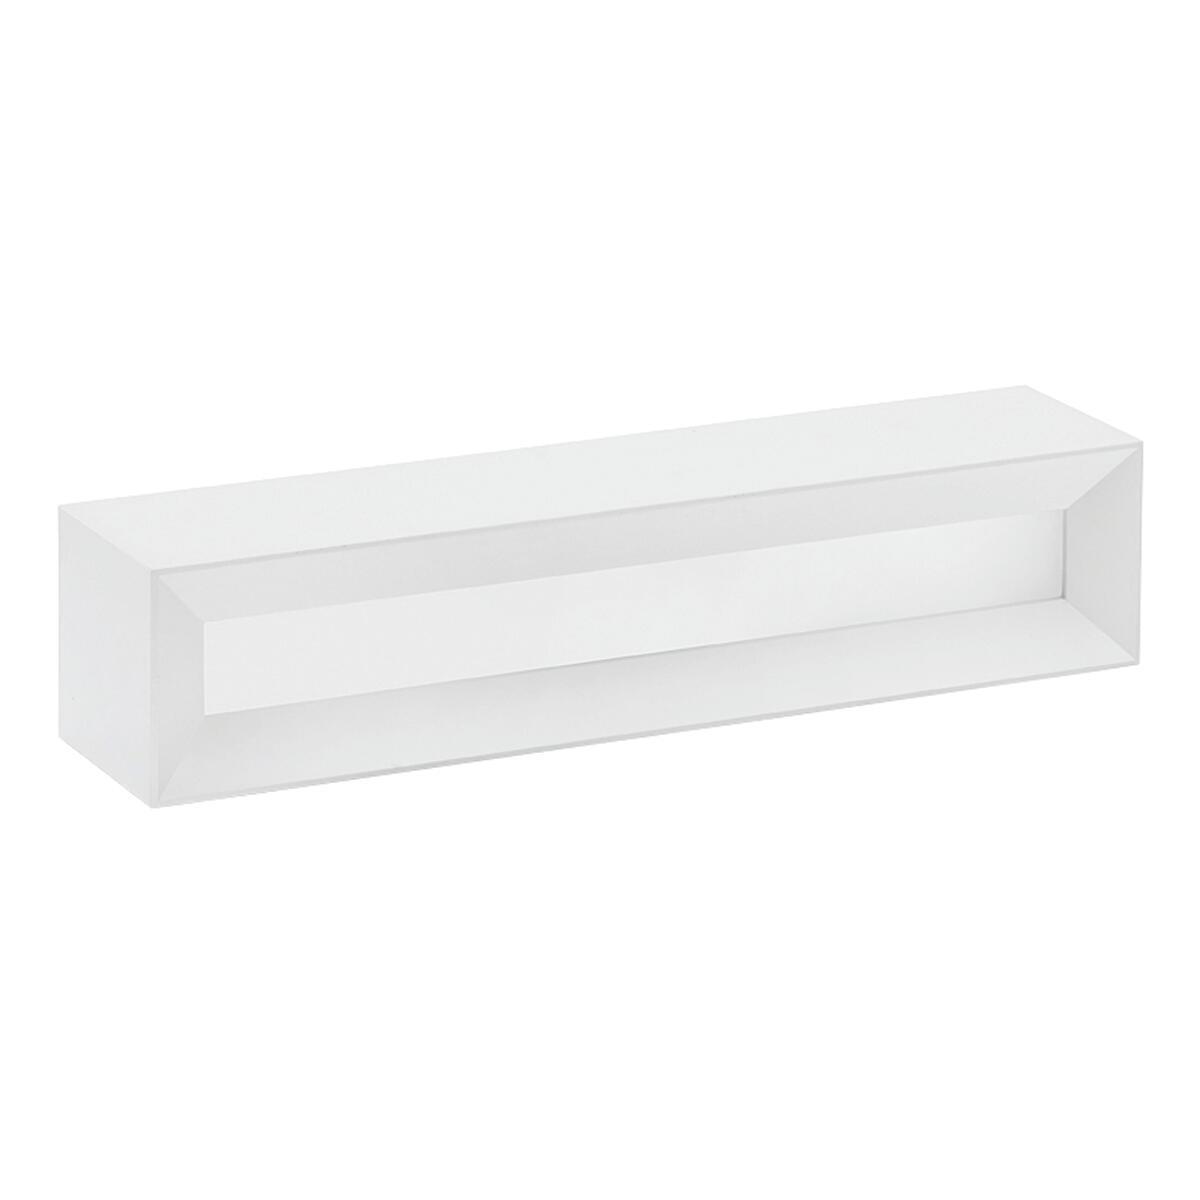 Applique design Hermione bianco, in gesso, 7x35 cm, 2 luci TECNICO - 8